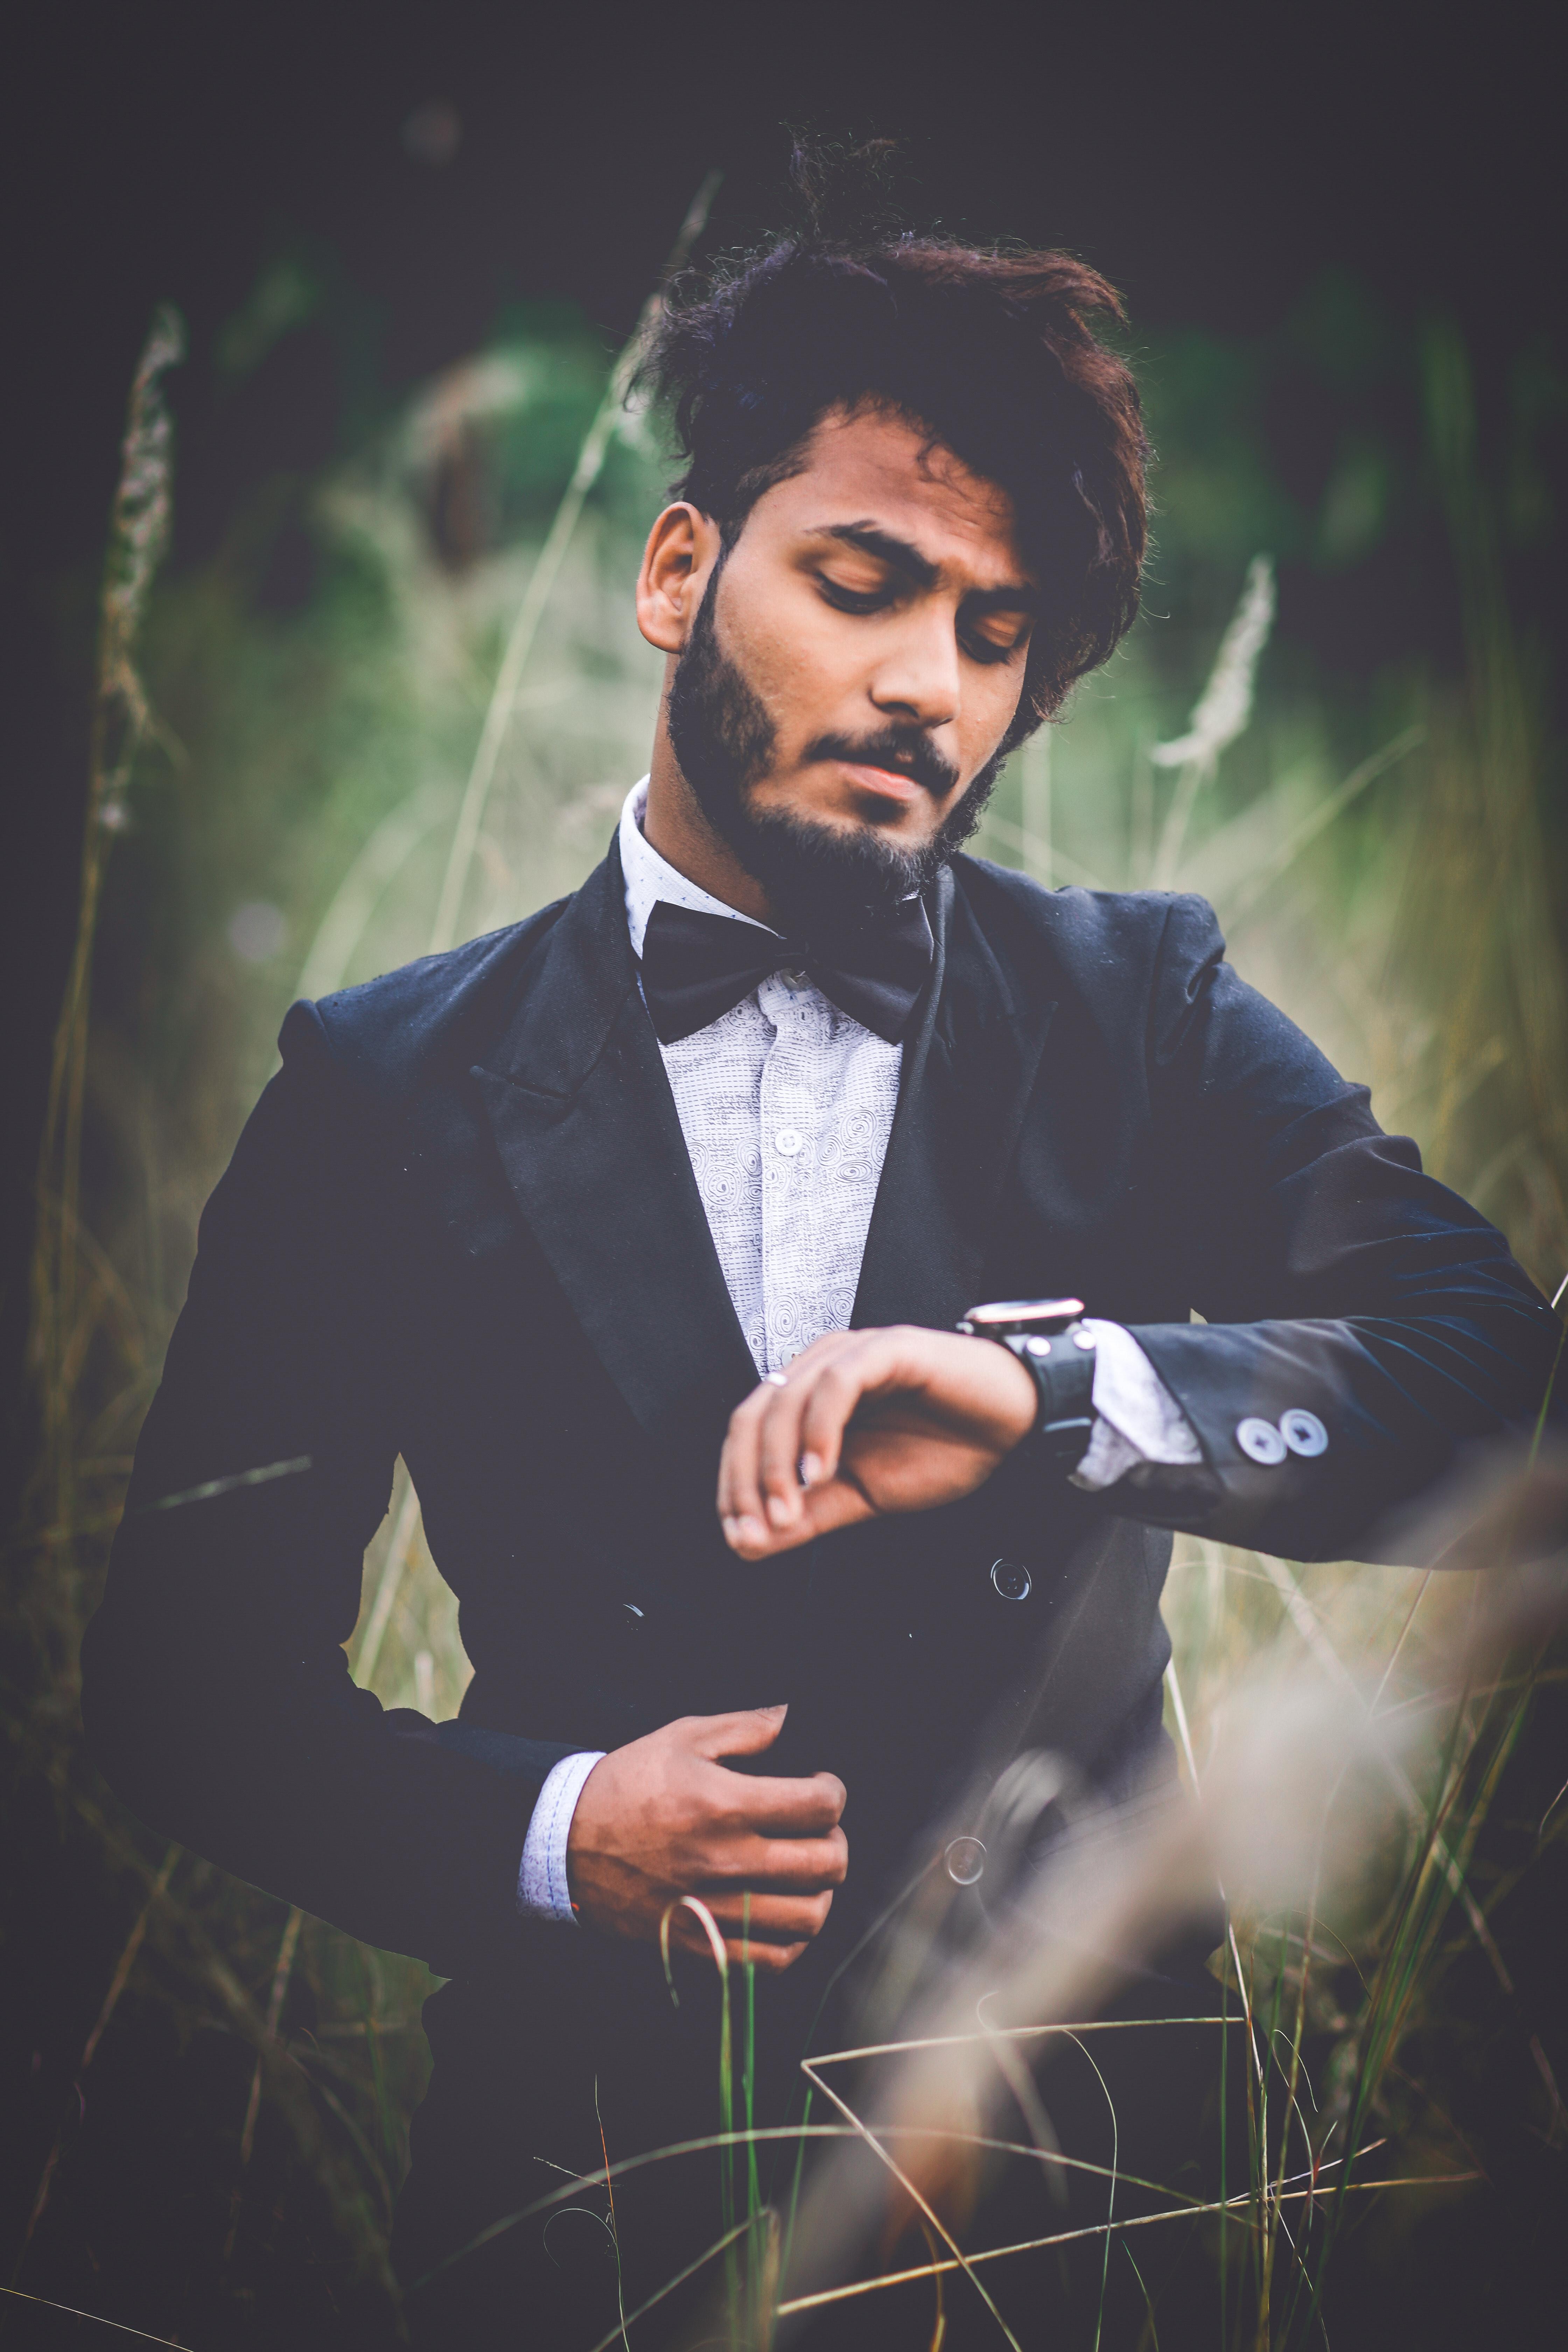 adult-blur-bow-tie-804714.jpg